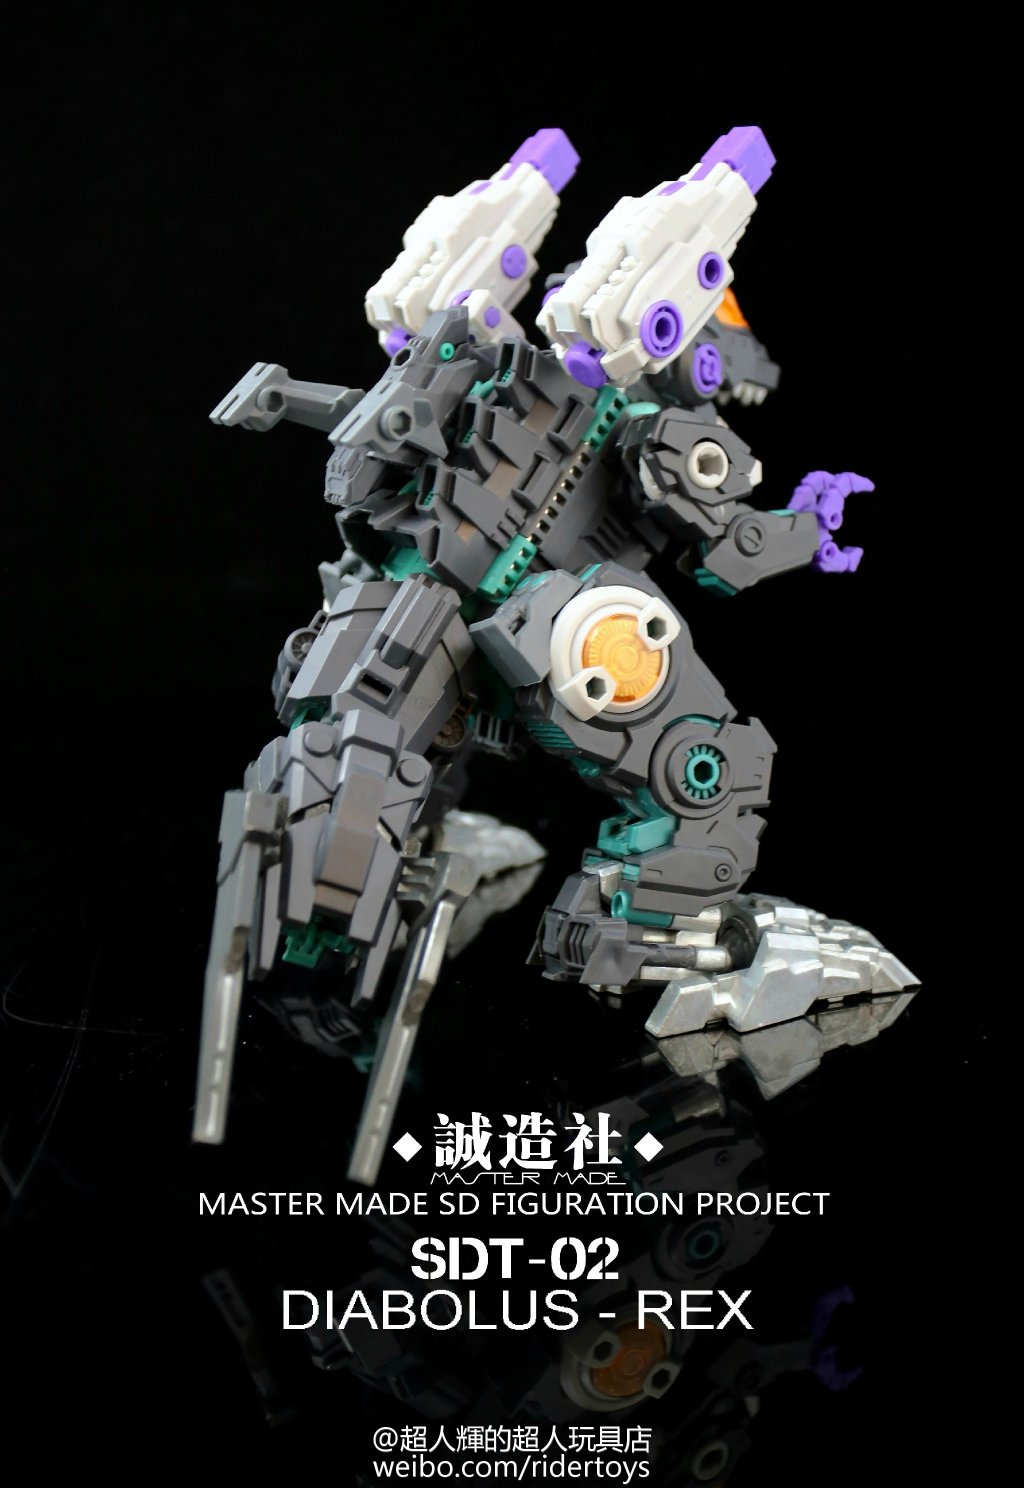 Produit Tiers - Figurine miniature déformé (transformable) - Par: Hero Hobby + MiniPower + Master Made Diabolus-Rex-04